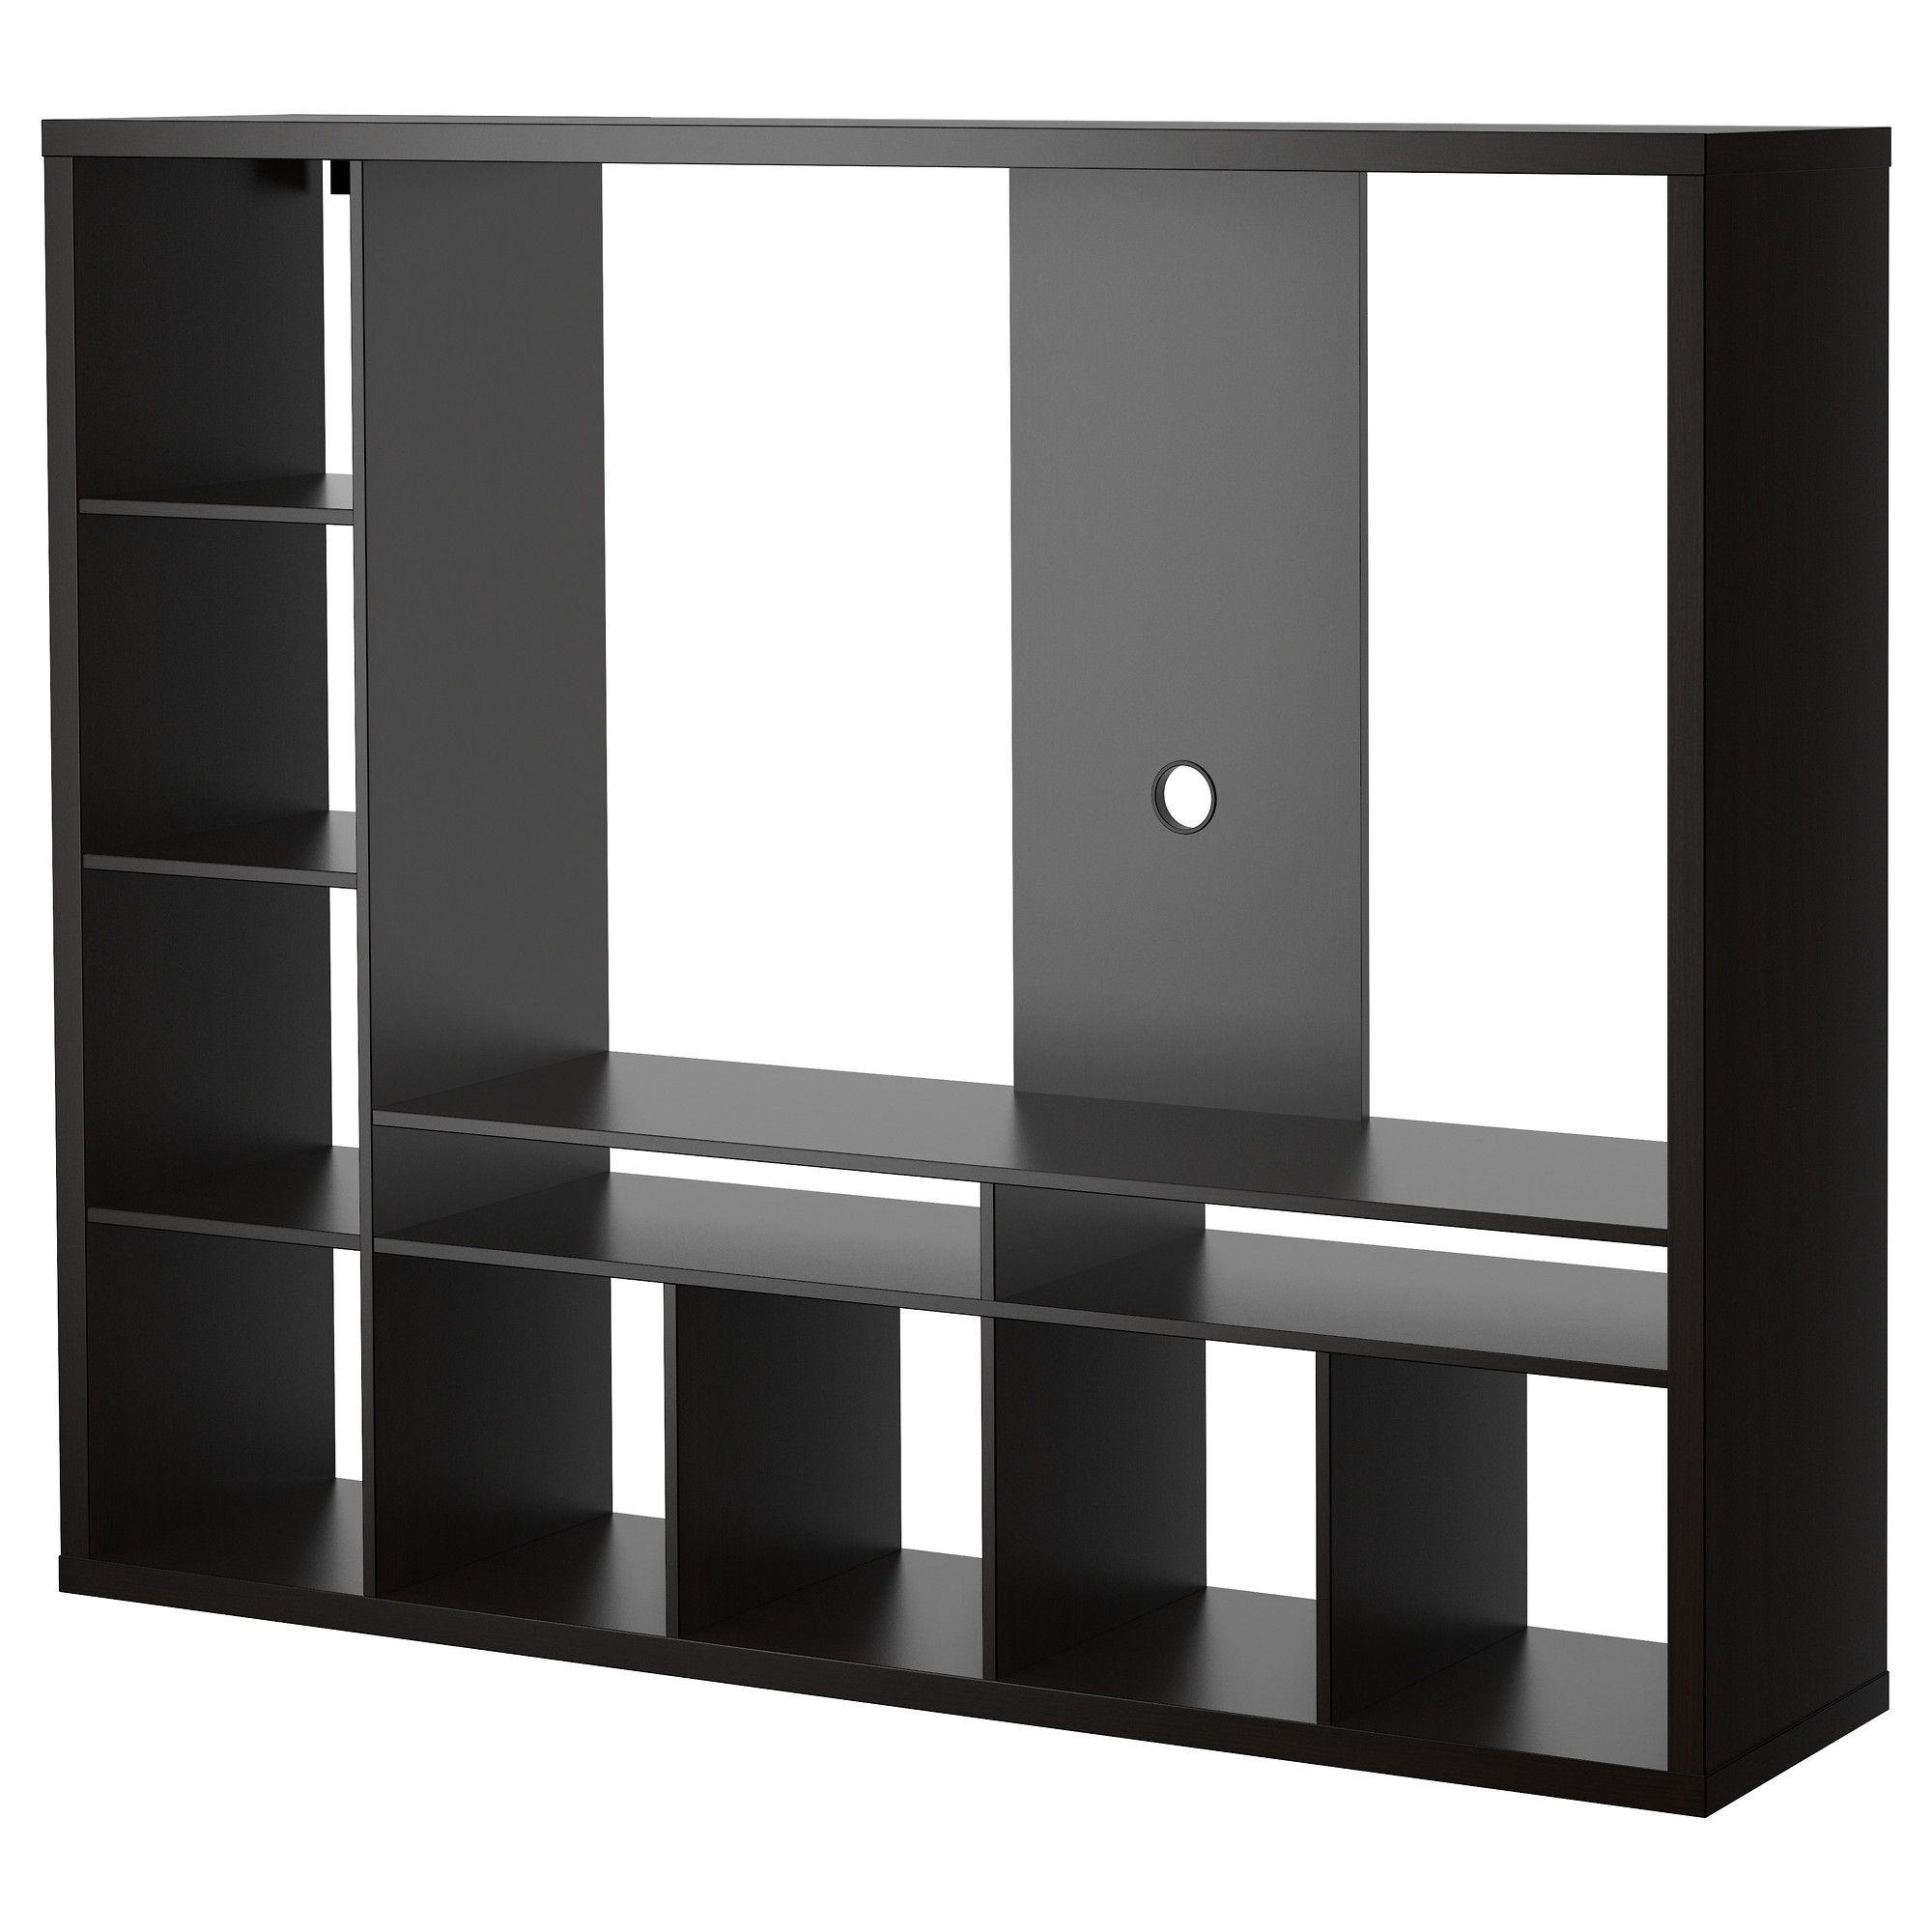 Ikea Tv Meubel Zwartbruin.Tv Meubel Lappland Zwartbruin Home Ikea Tv Meubels En Retro Huis